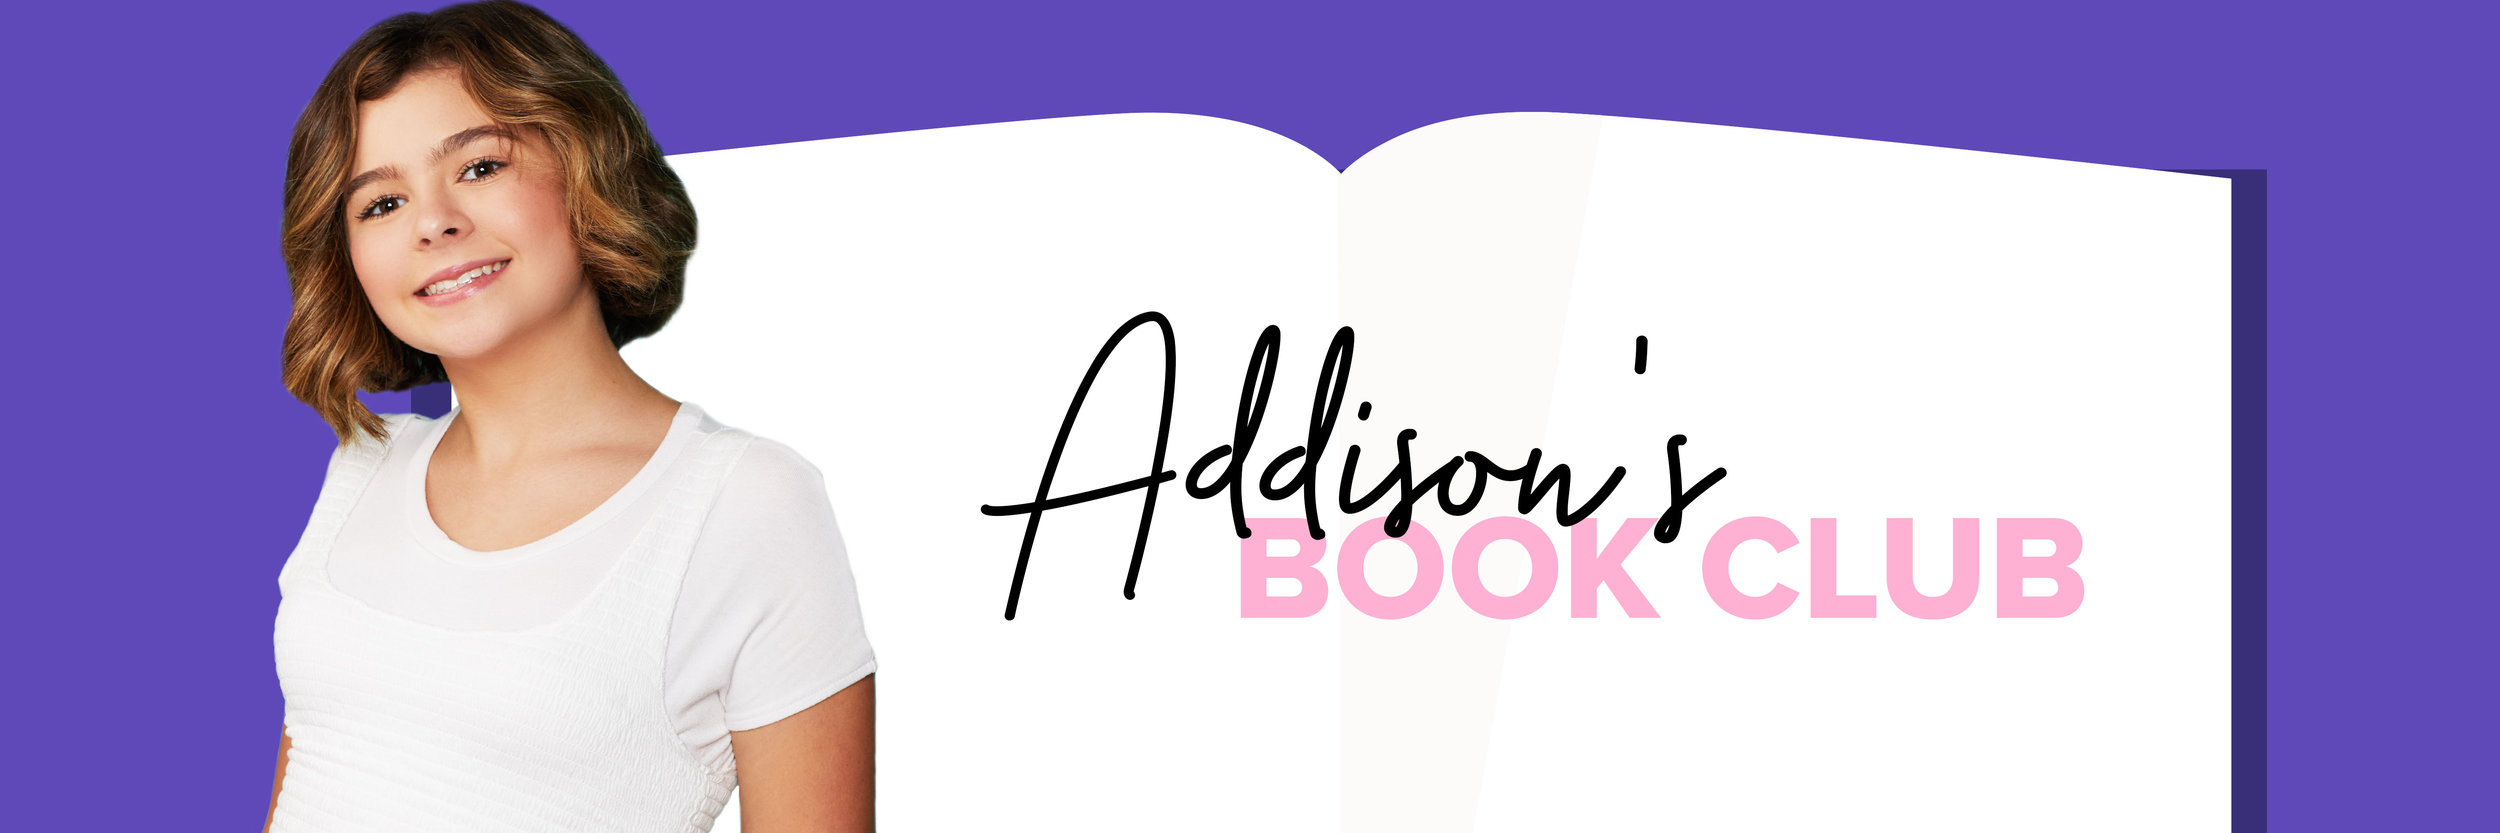 Addison-Book-Club_Banner.jpg